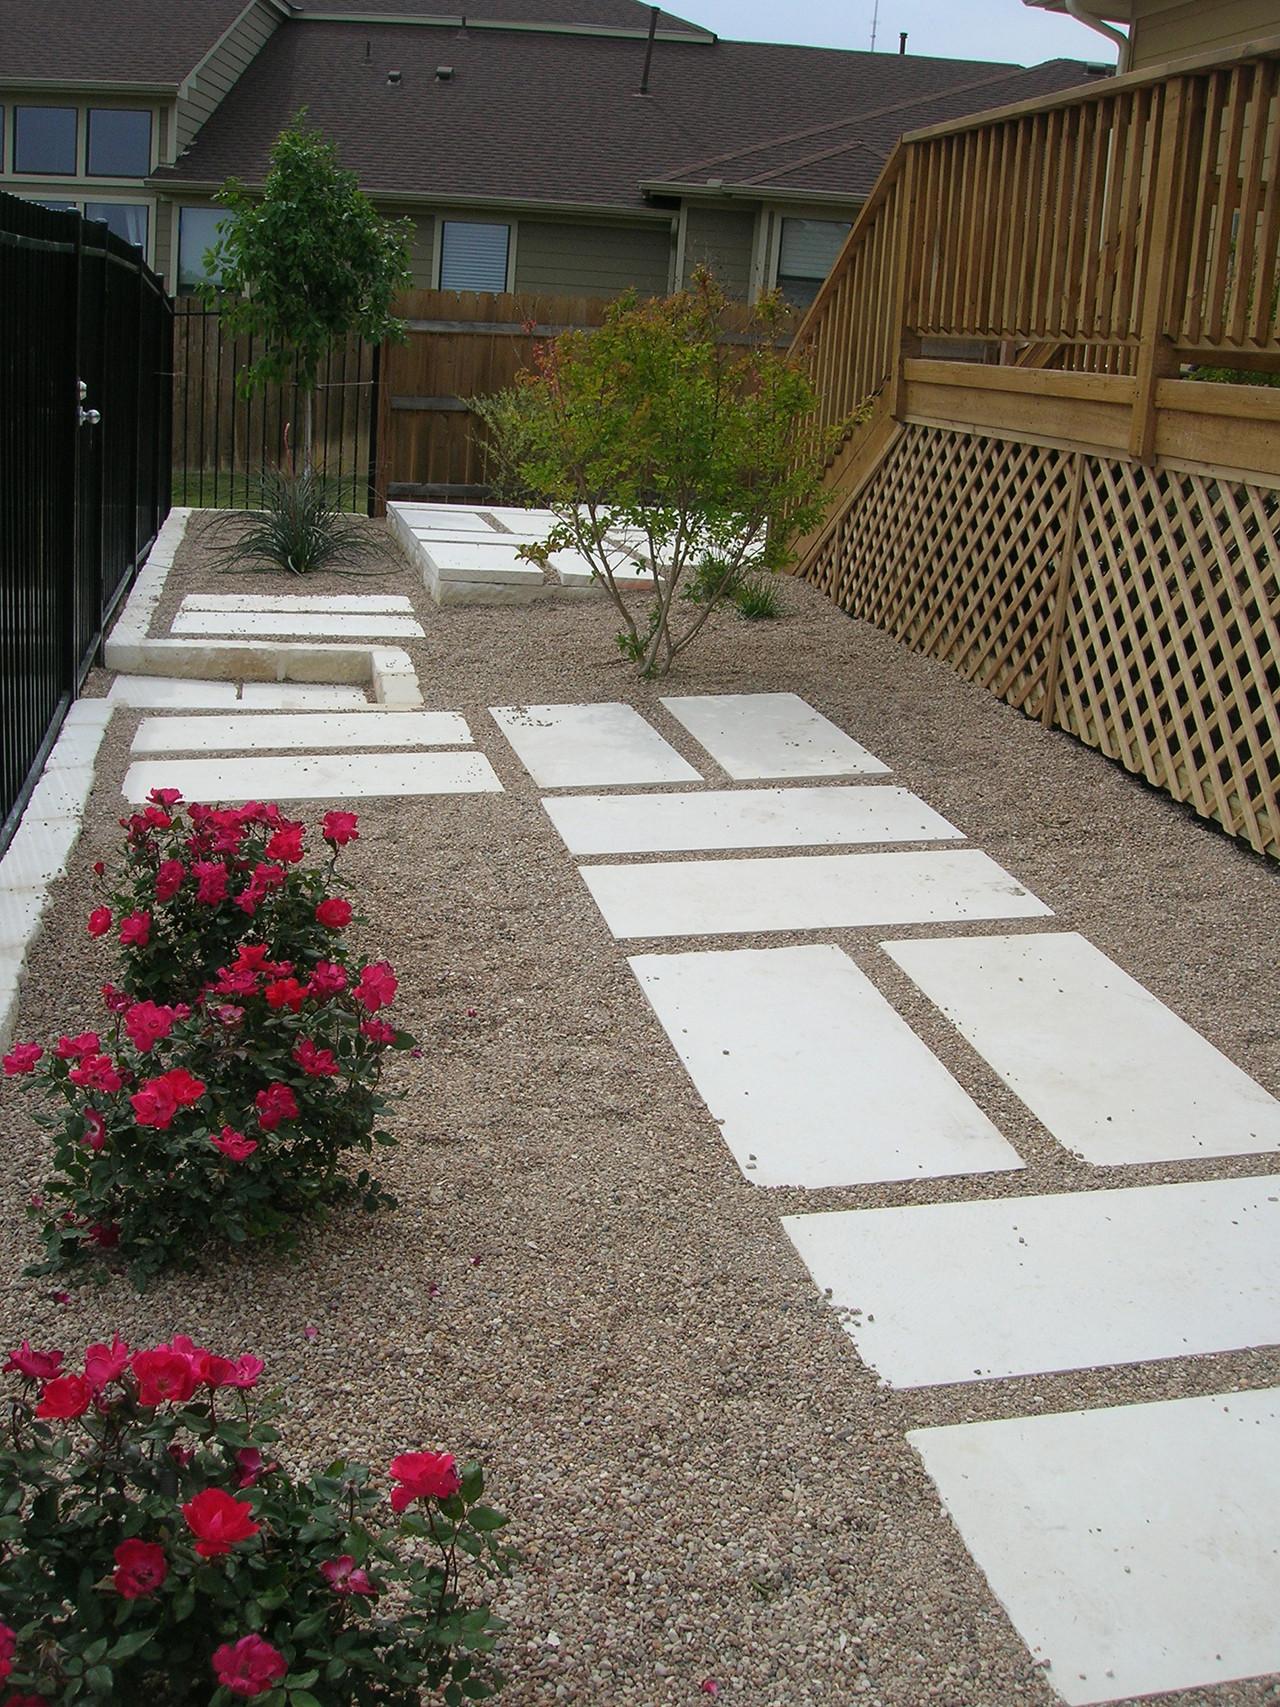 Best ideas about Backyard Landscape Ideas . Save or Pin 50 Best Backyard Landscaping Ideas and Designs in 2019 Now.